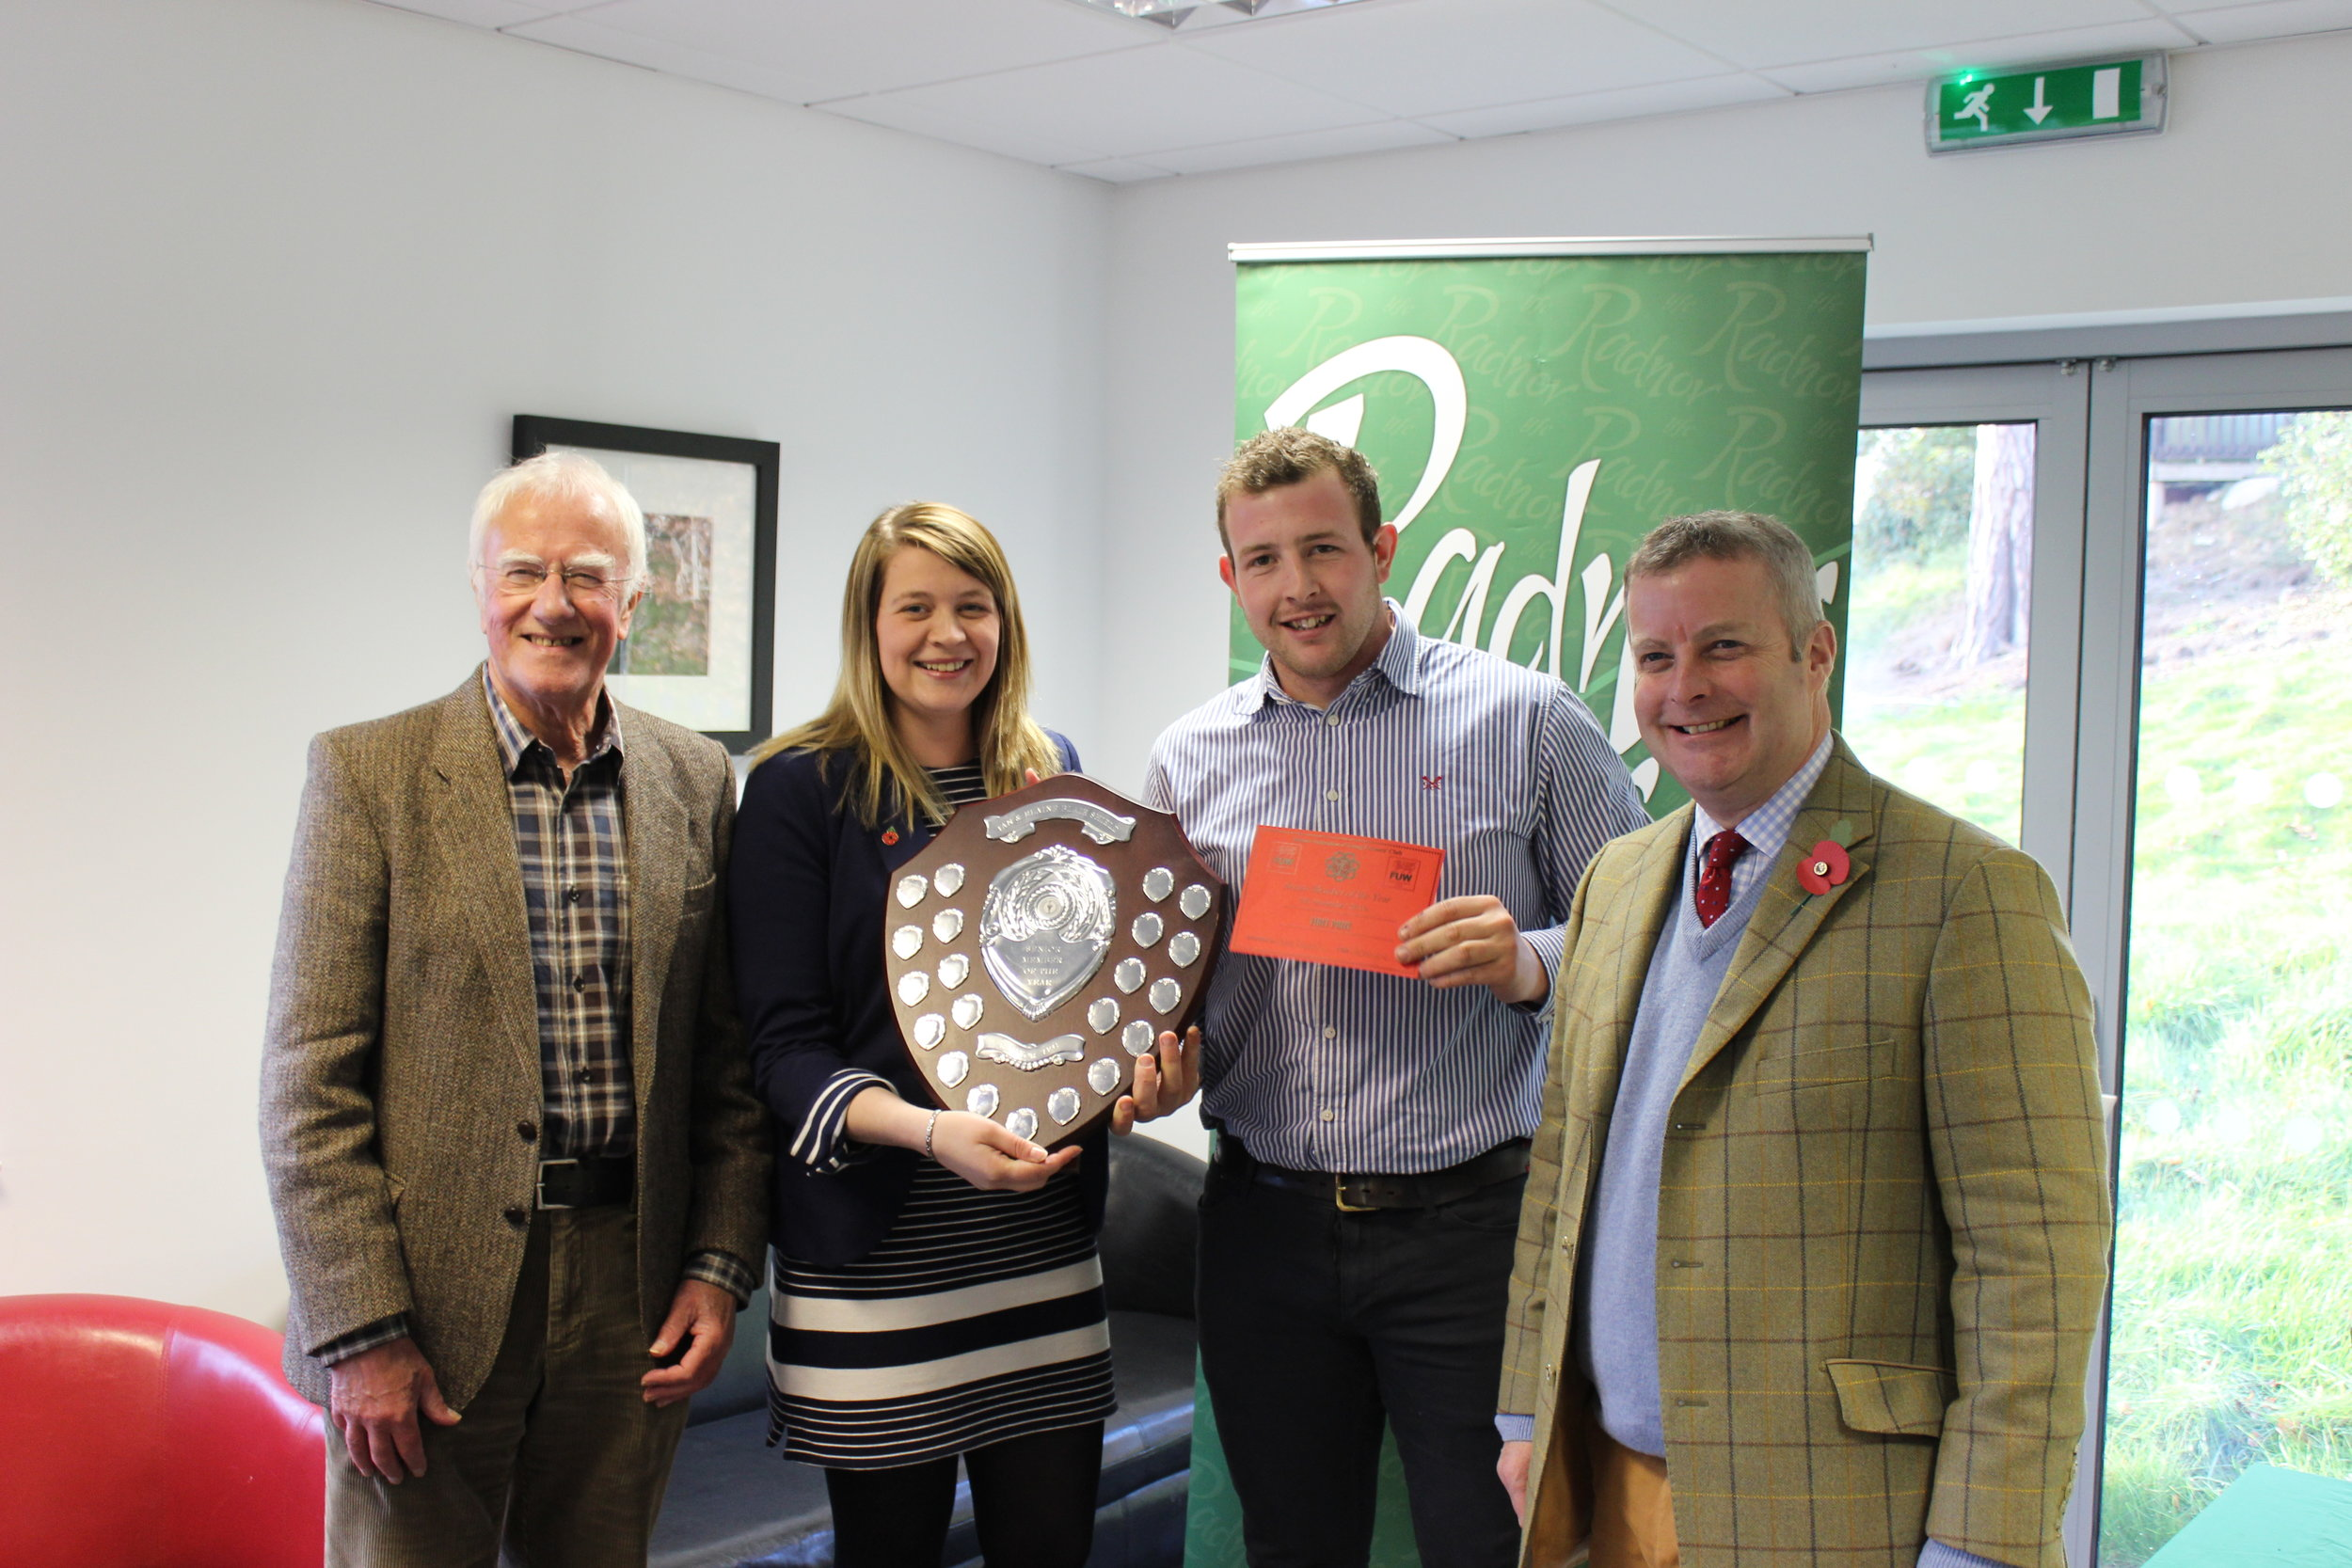 Owen Davies, Presteigne YFC with judges Ian Blair, Fay Thomas & Chris Davies MP